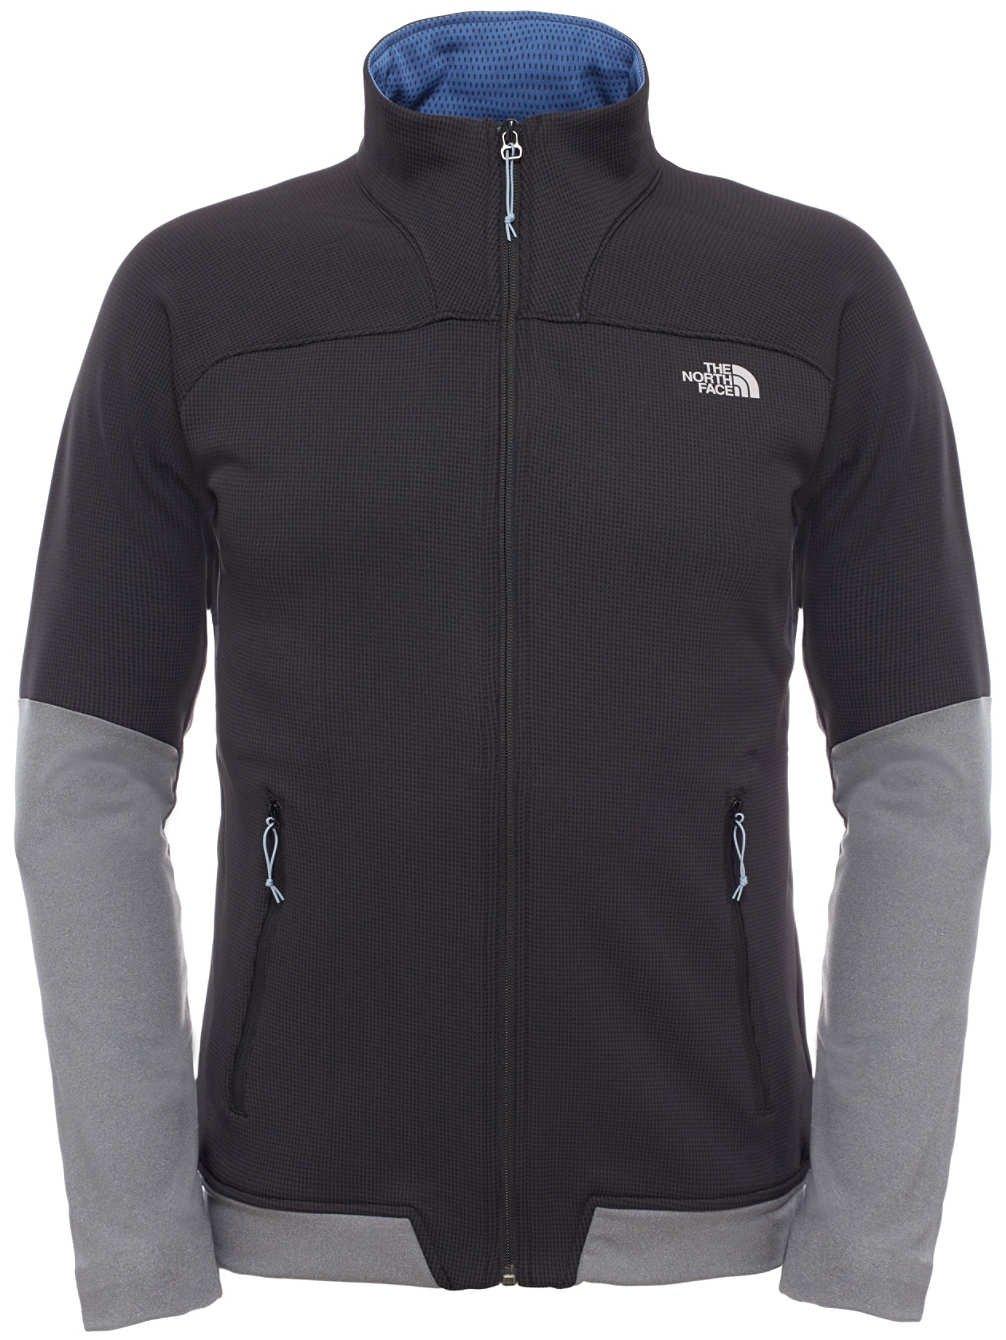 44fa29d77 The North Face Men's Defrosium Eu Fleece Jacket: Amazon.co.uk ...